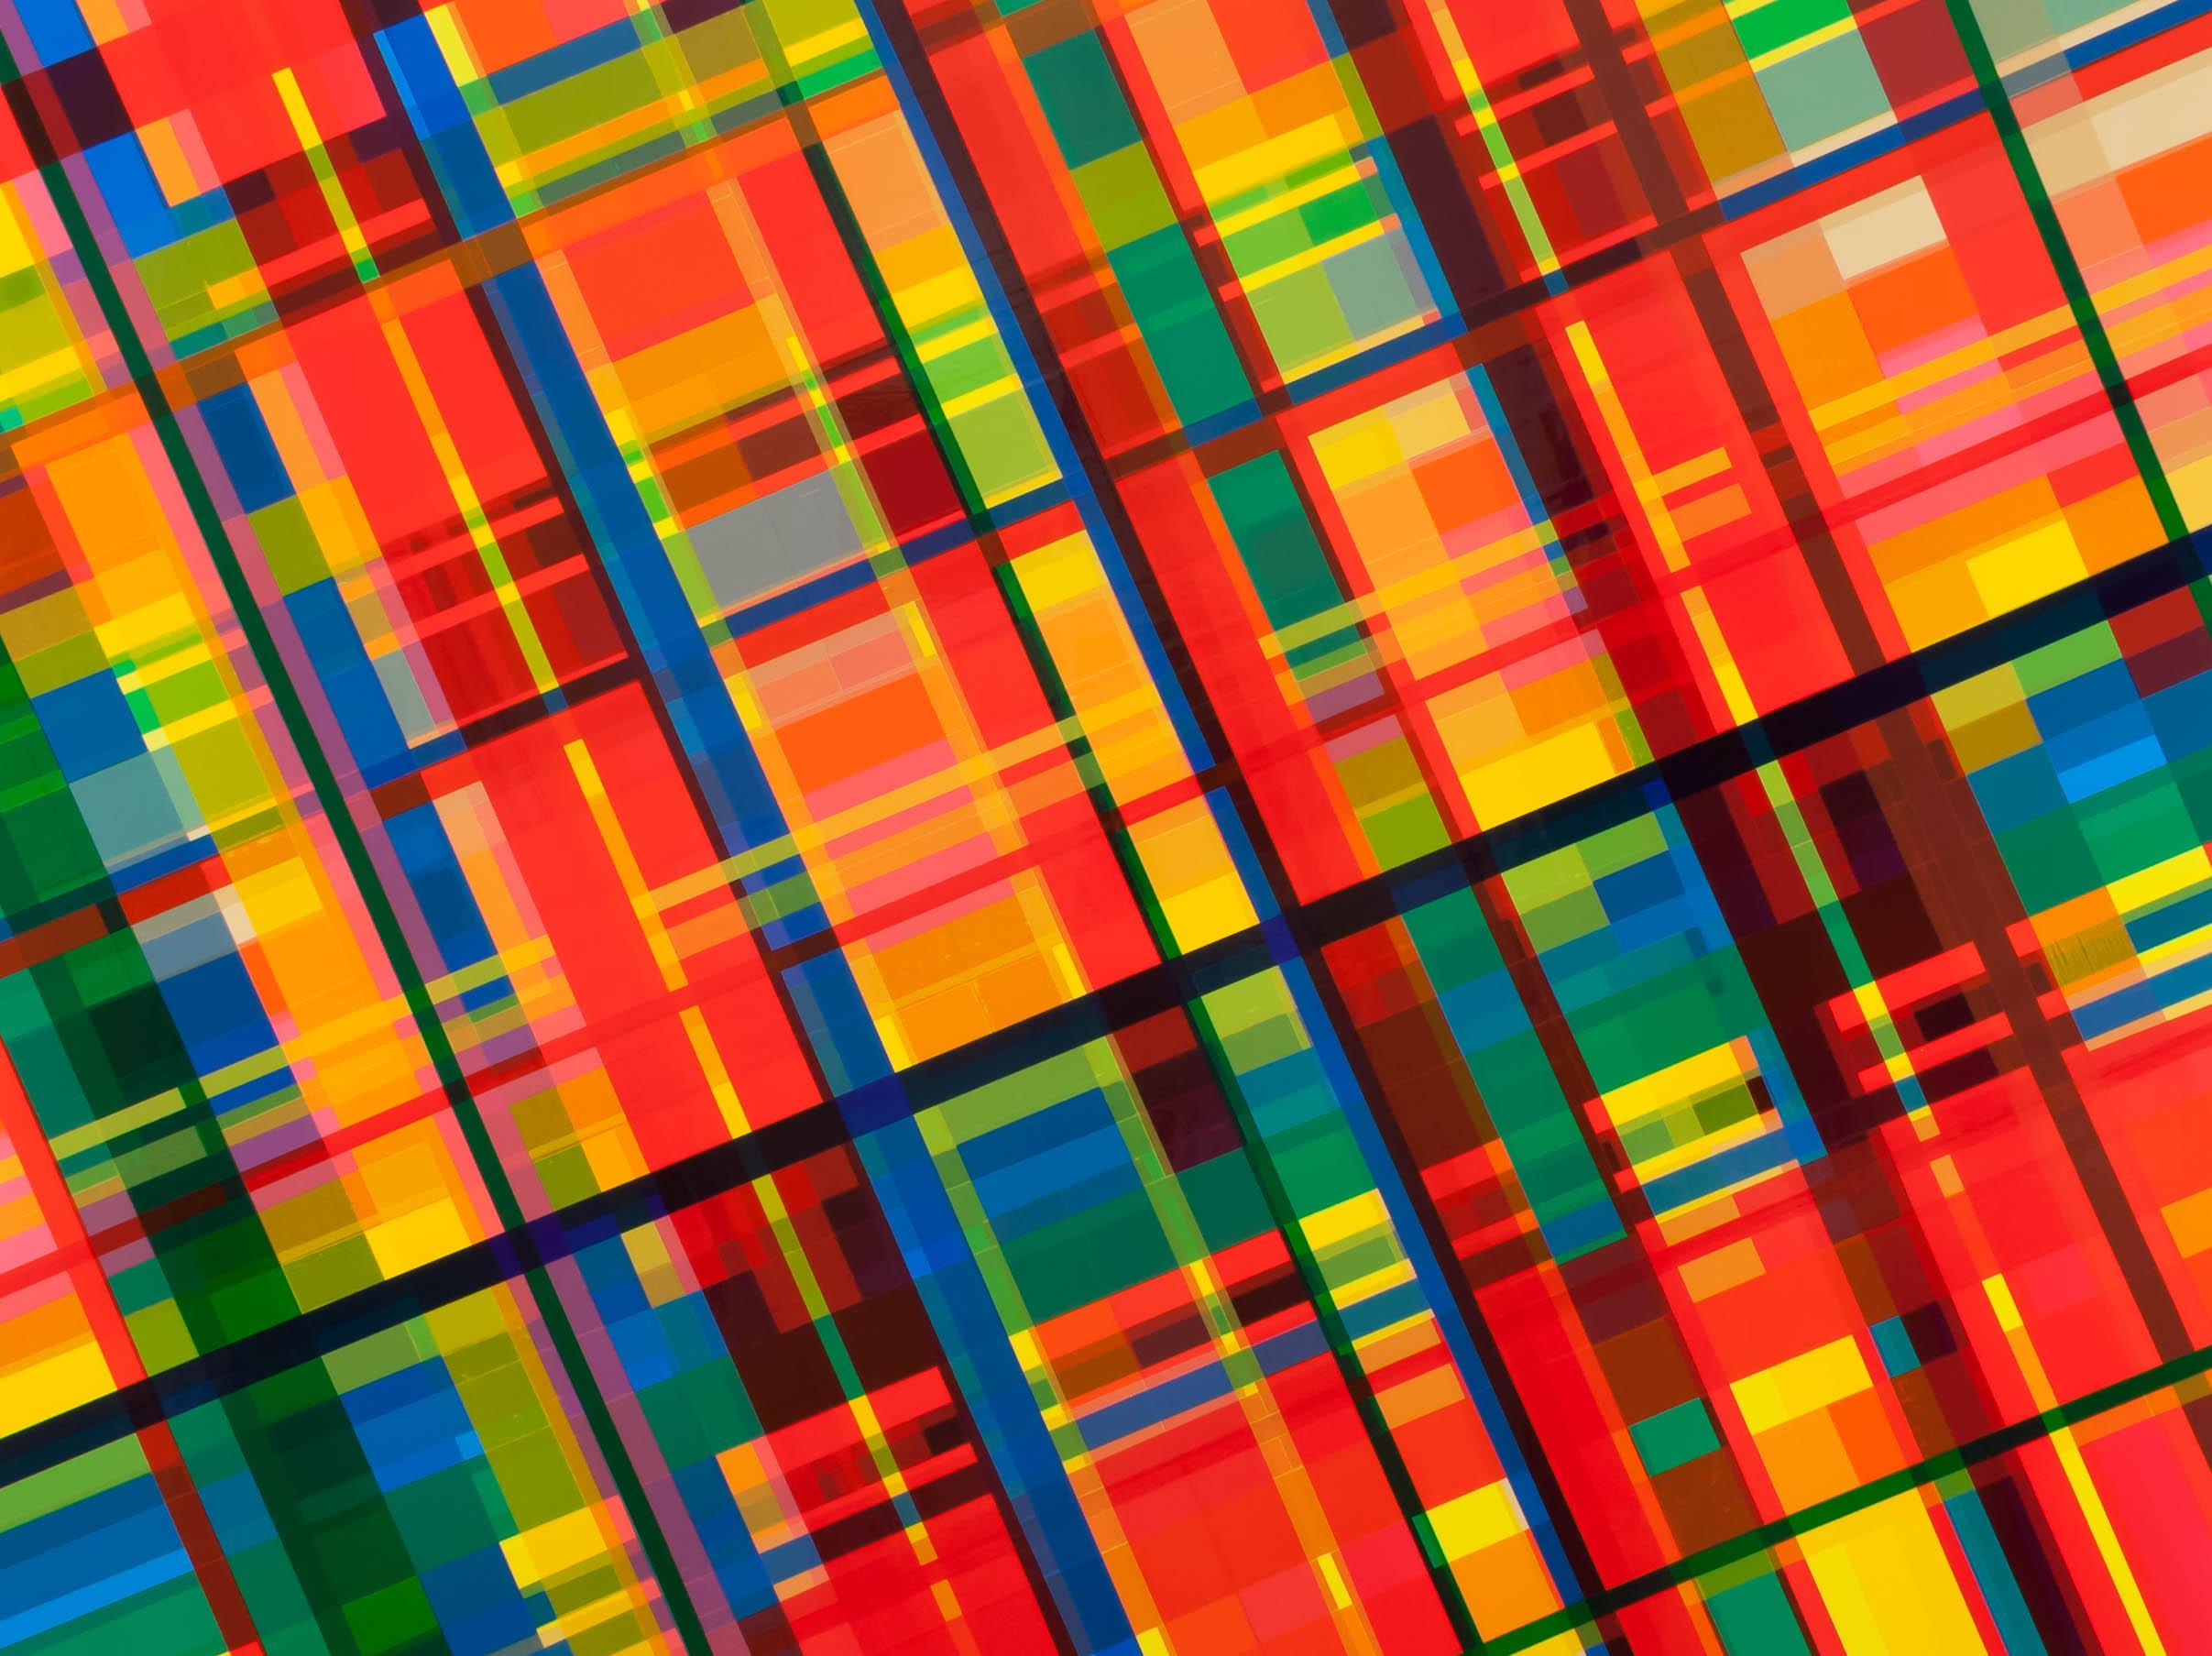 Nectarine Joys, 2012, semi-transparent tape on panel, 36 x 48 inches